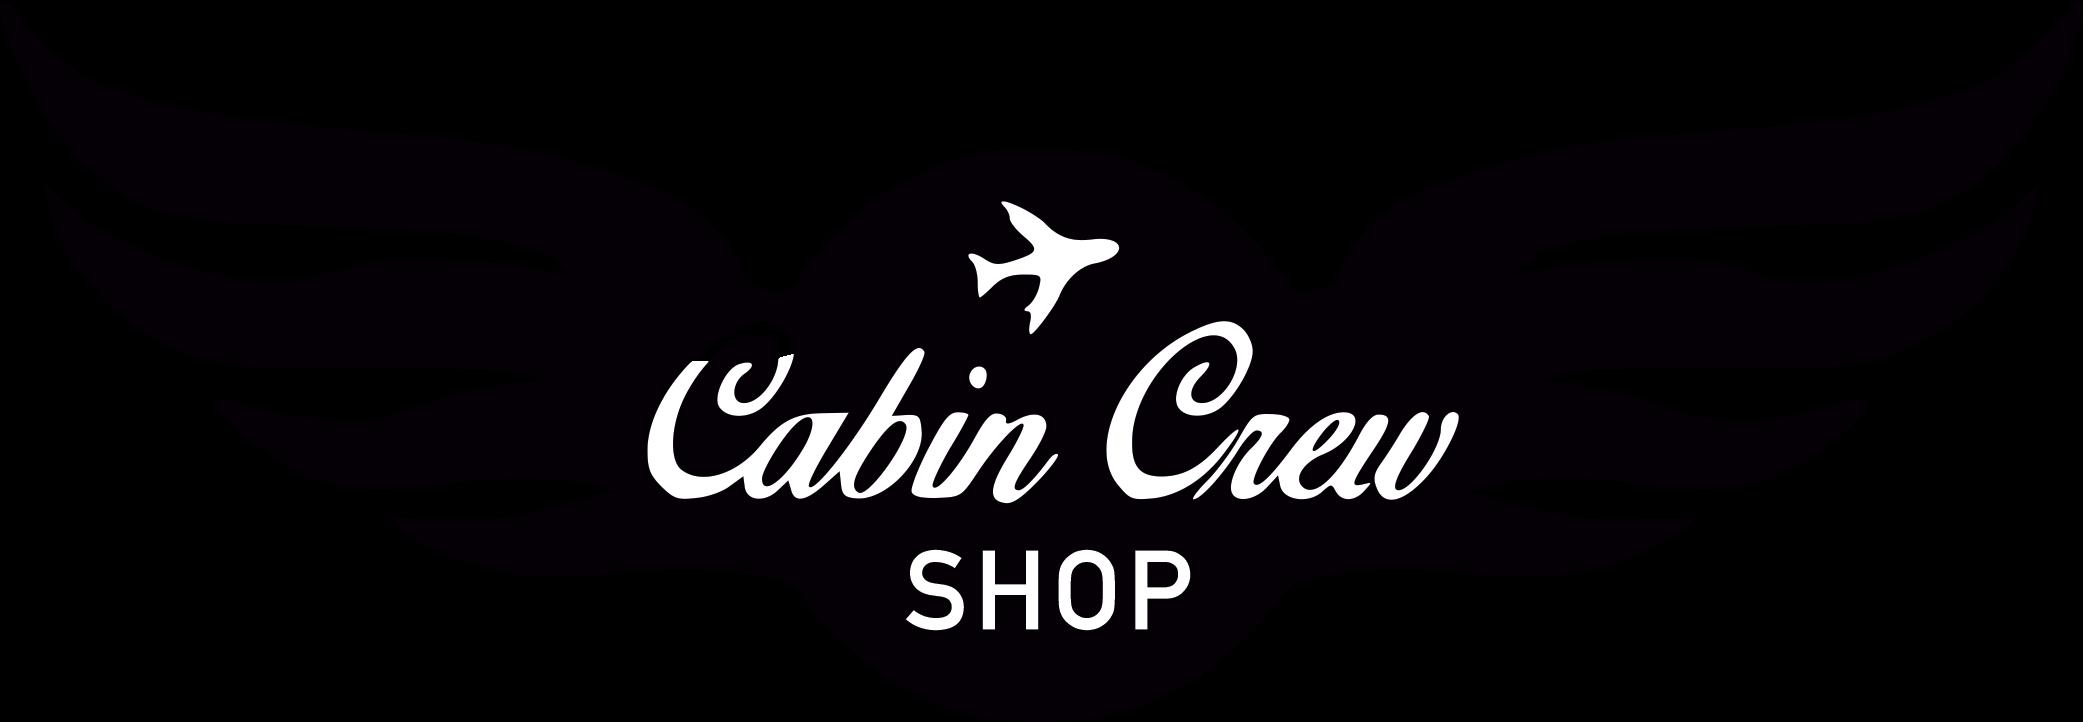 Cabin Crew Shop